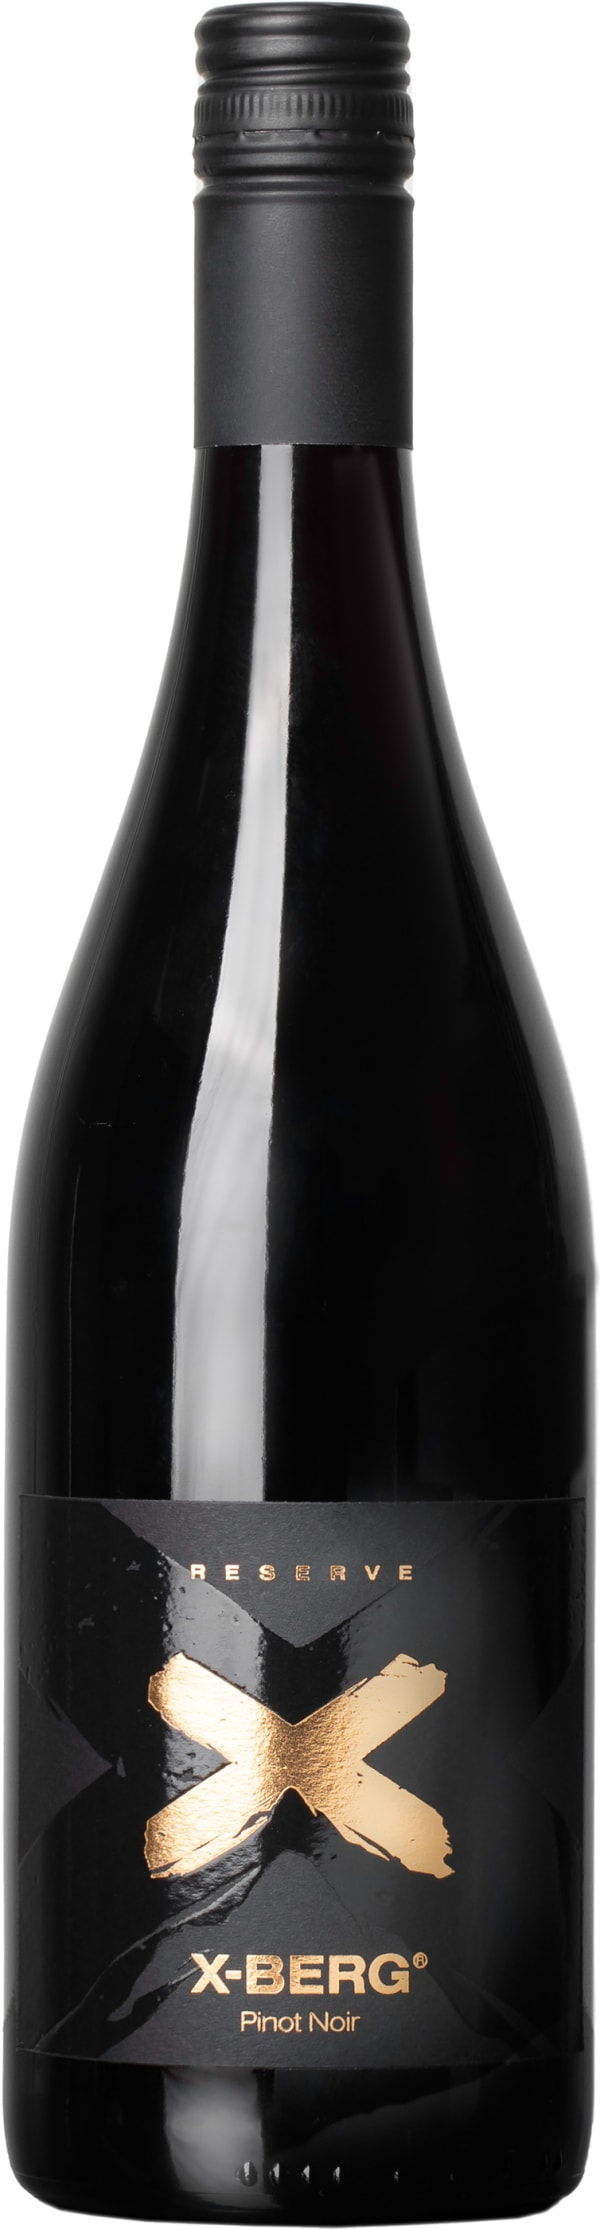 X-Berg Pinot Noir 2014